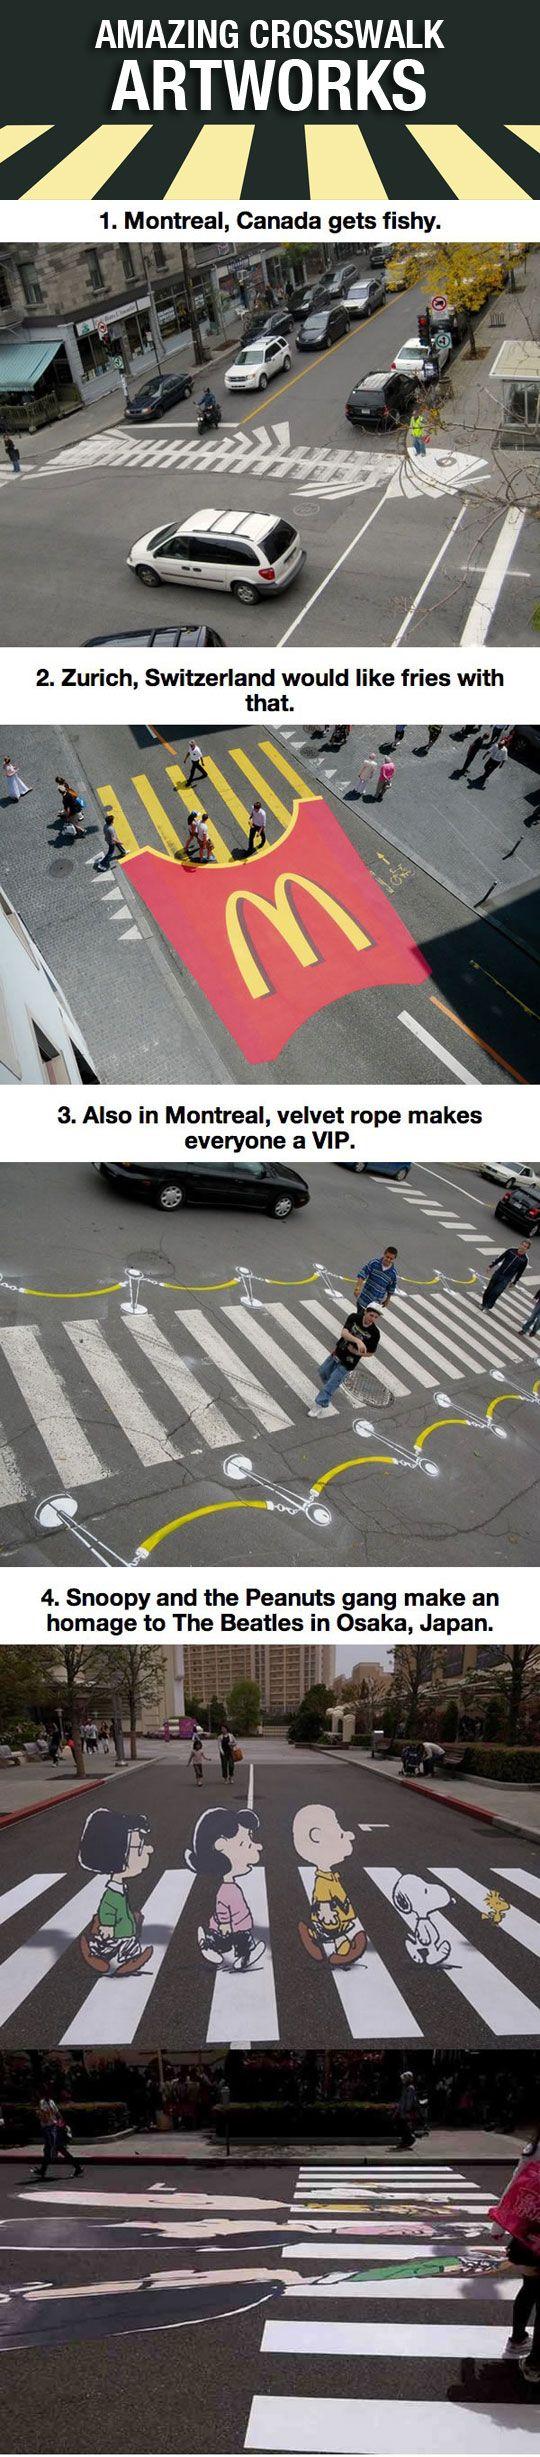 Amazing Street-Artwork